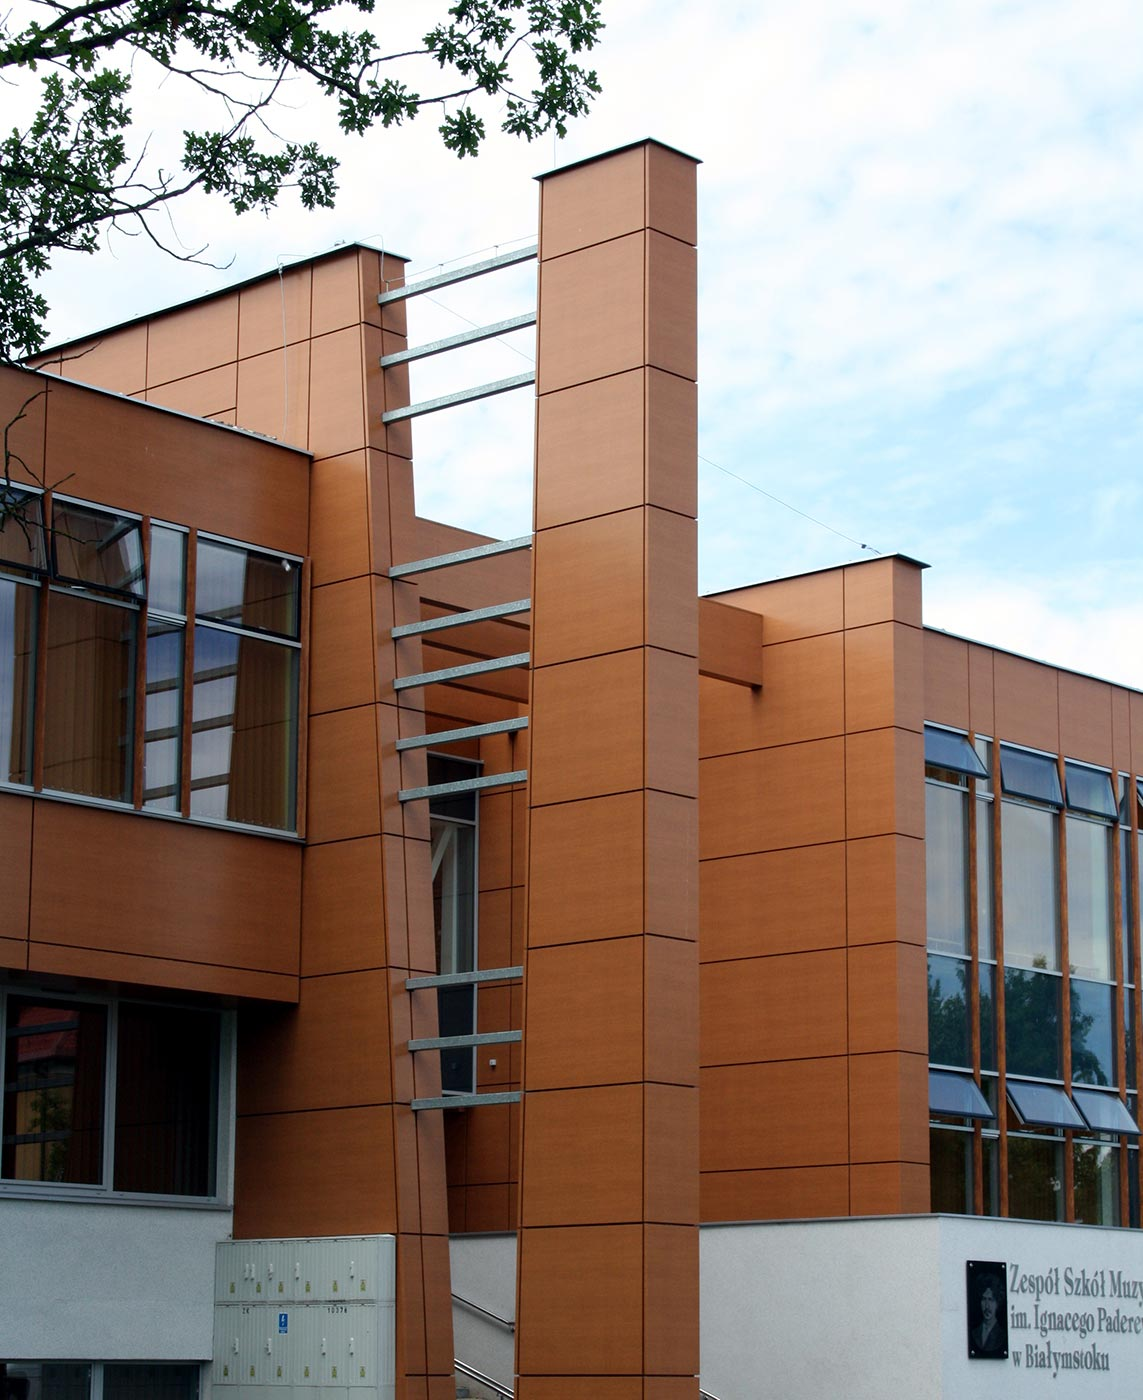 Escuela-de-musica-Bialystok.-Polonia.-WOOD-Walnut_01_1592308619.jpg